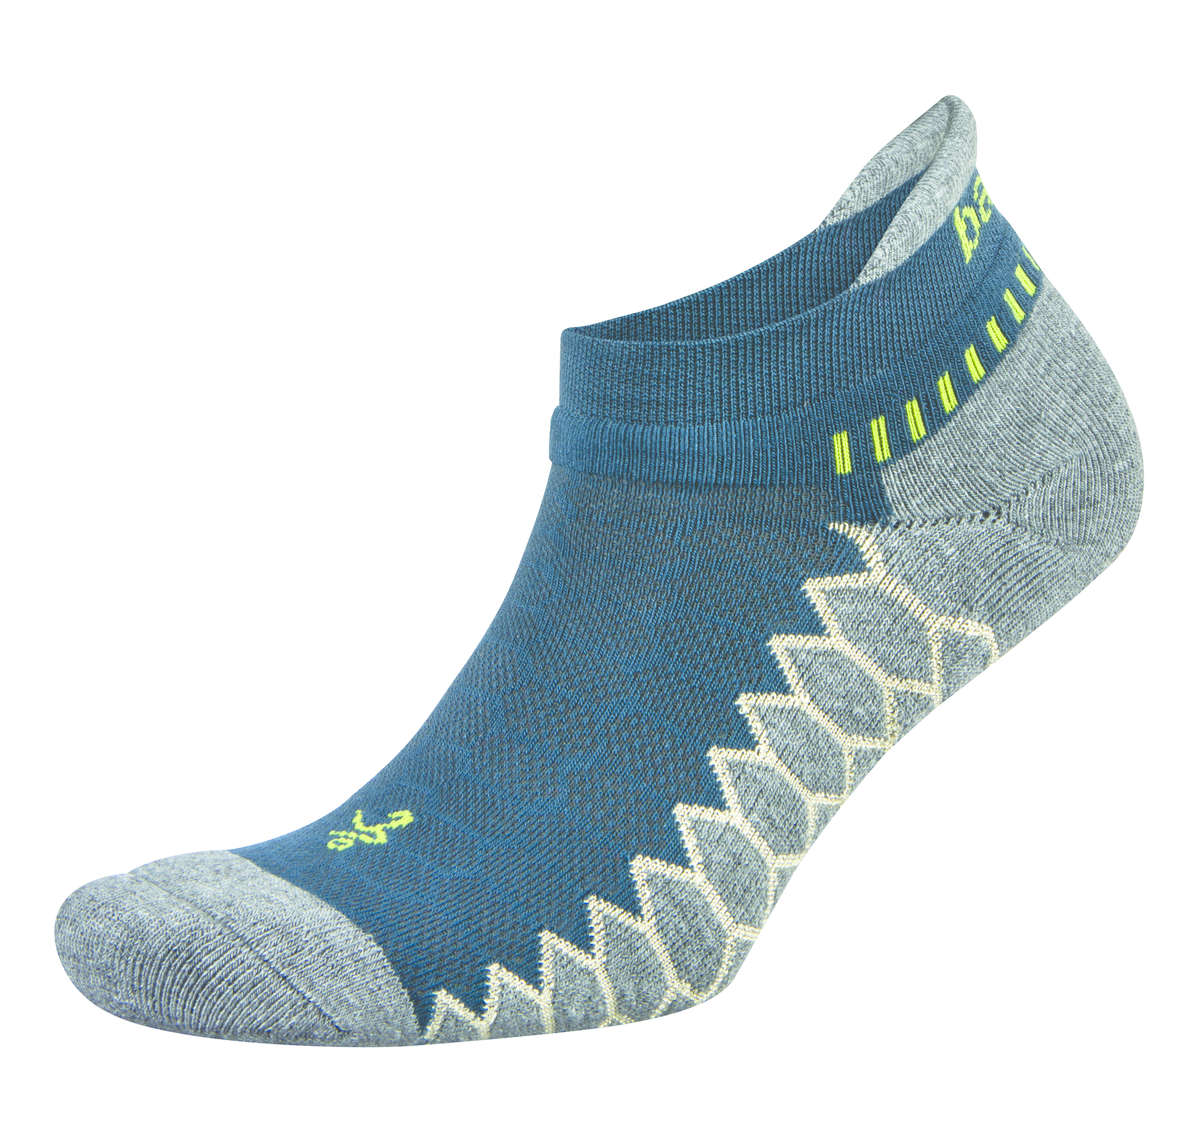 Balega Silver Sportsok Blauw/Grijs - XL